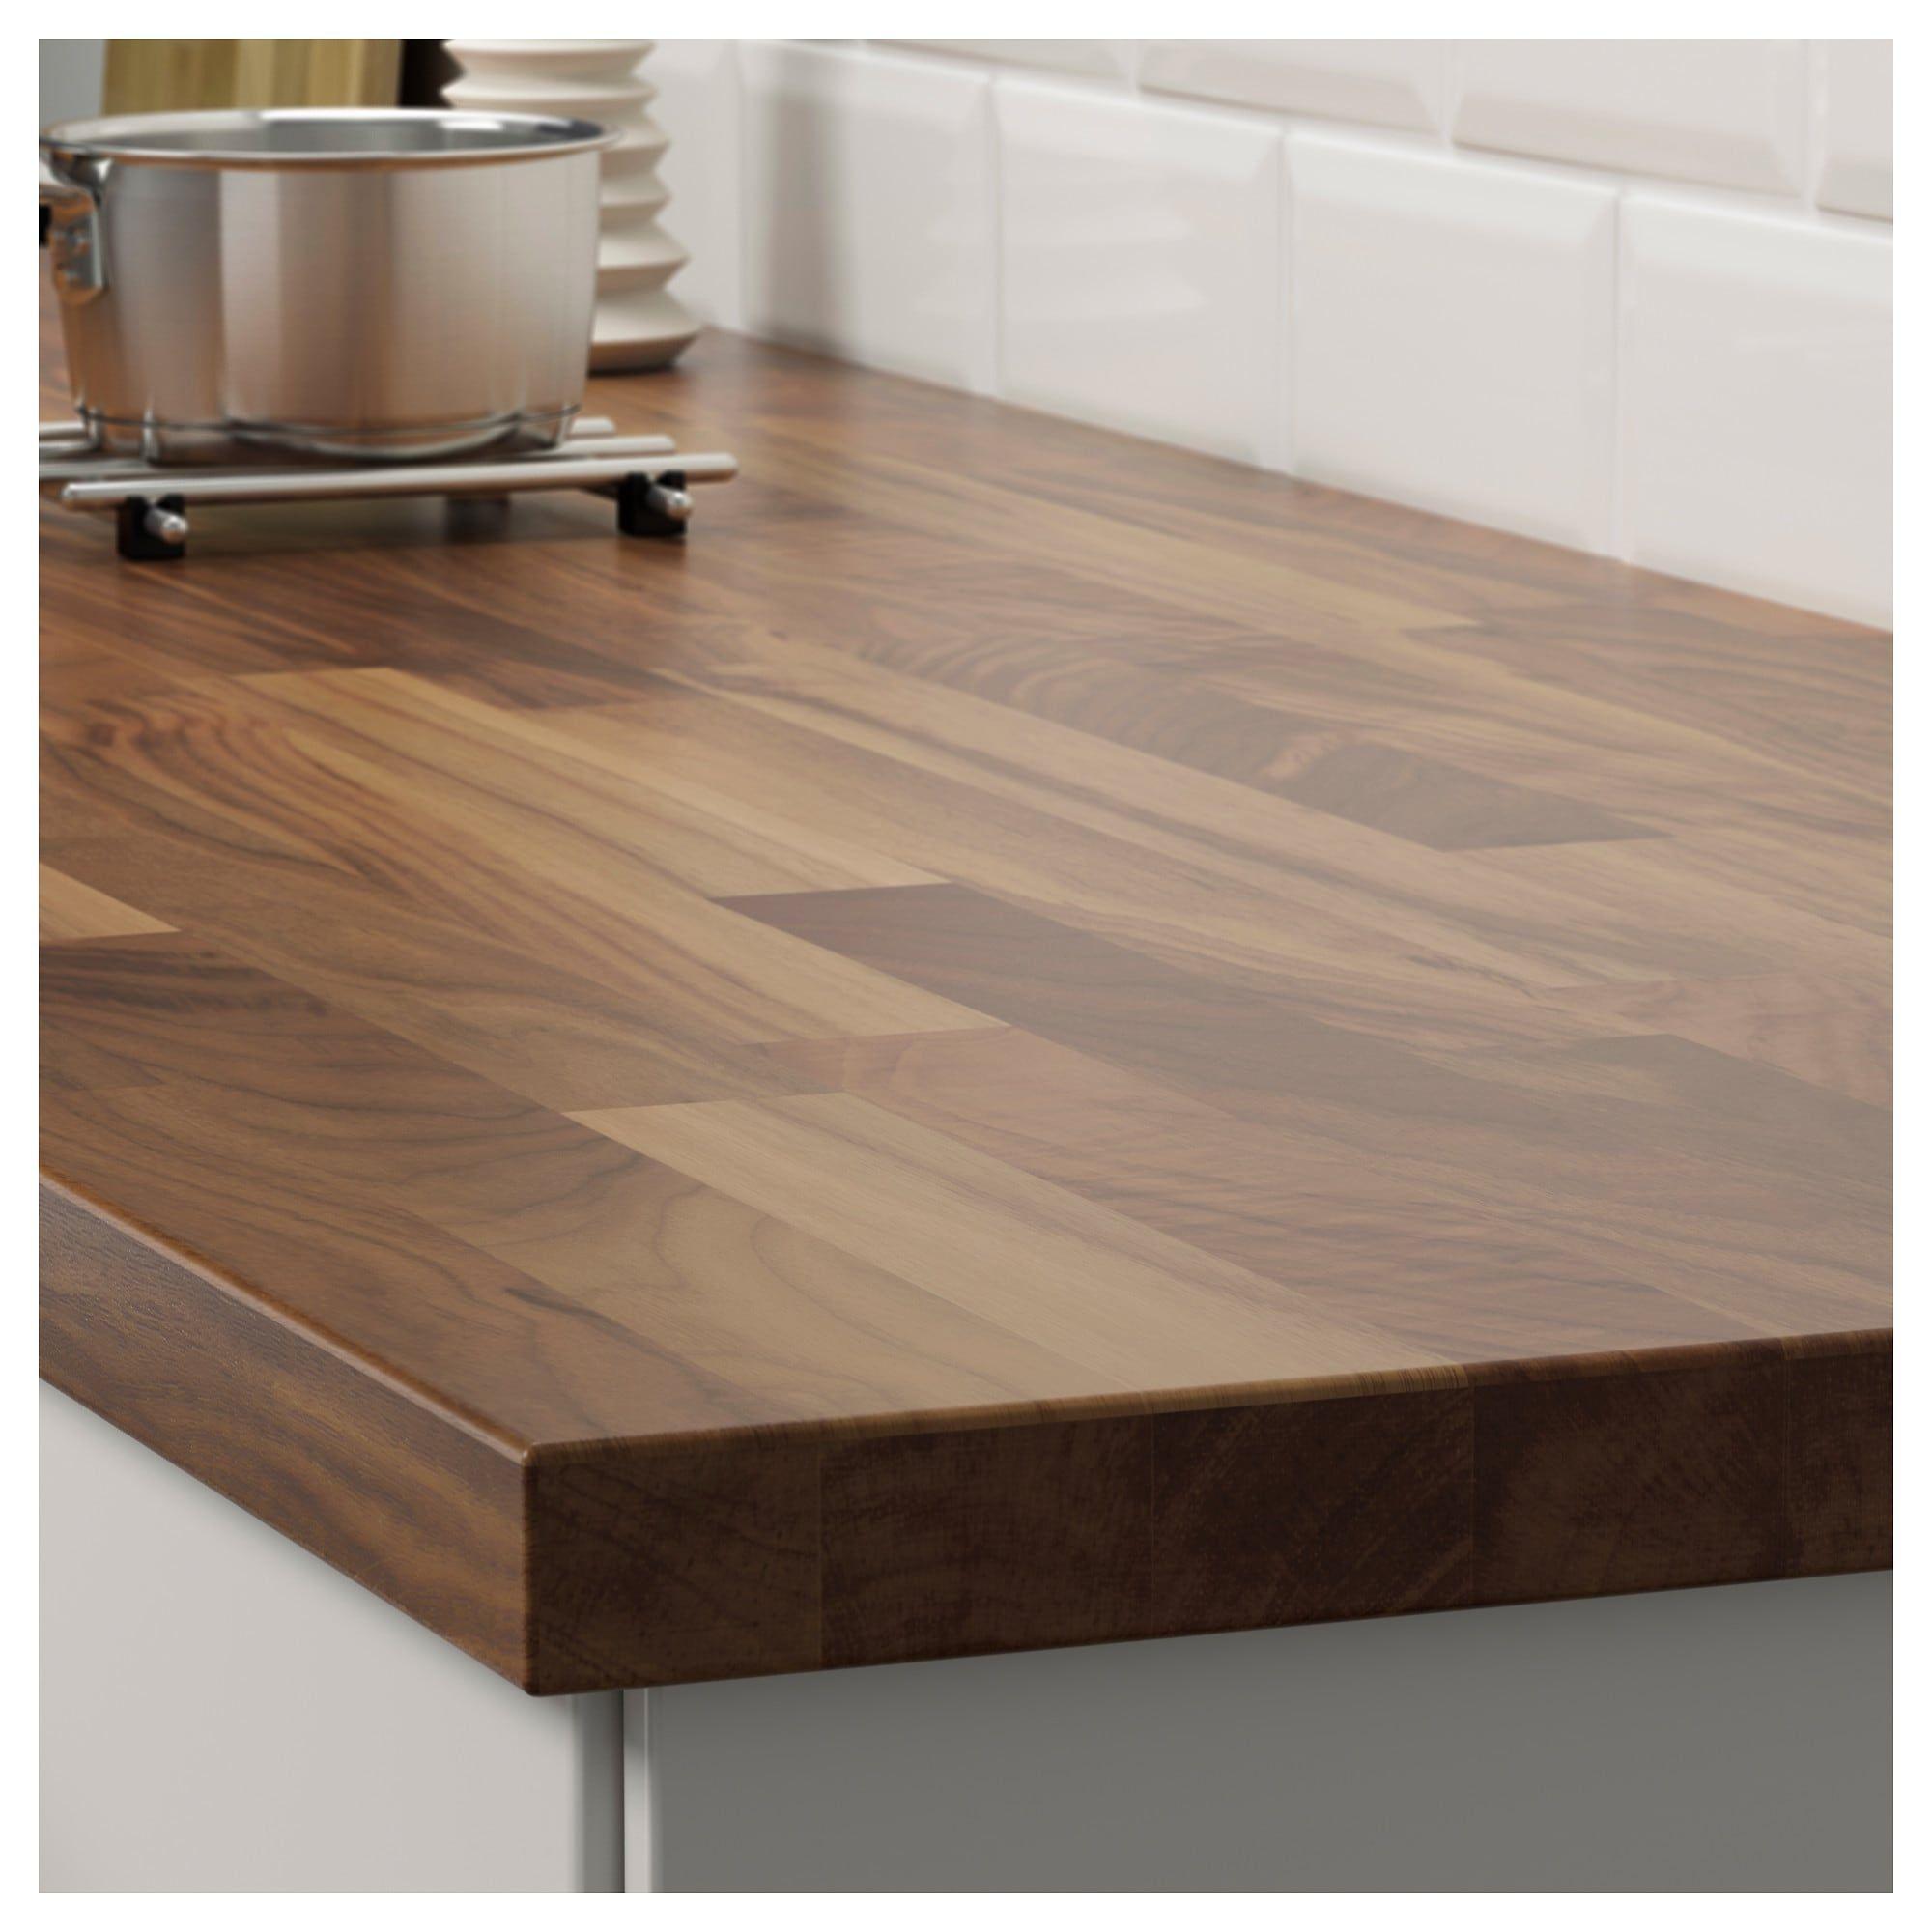 Ikea Karlby Countertop Walnut In 2019 Products